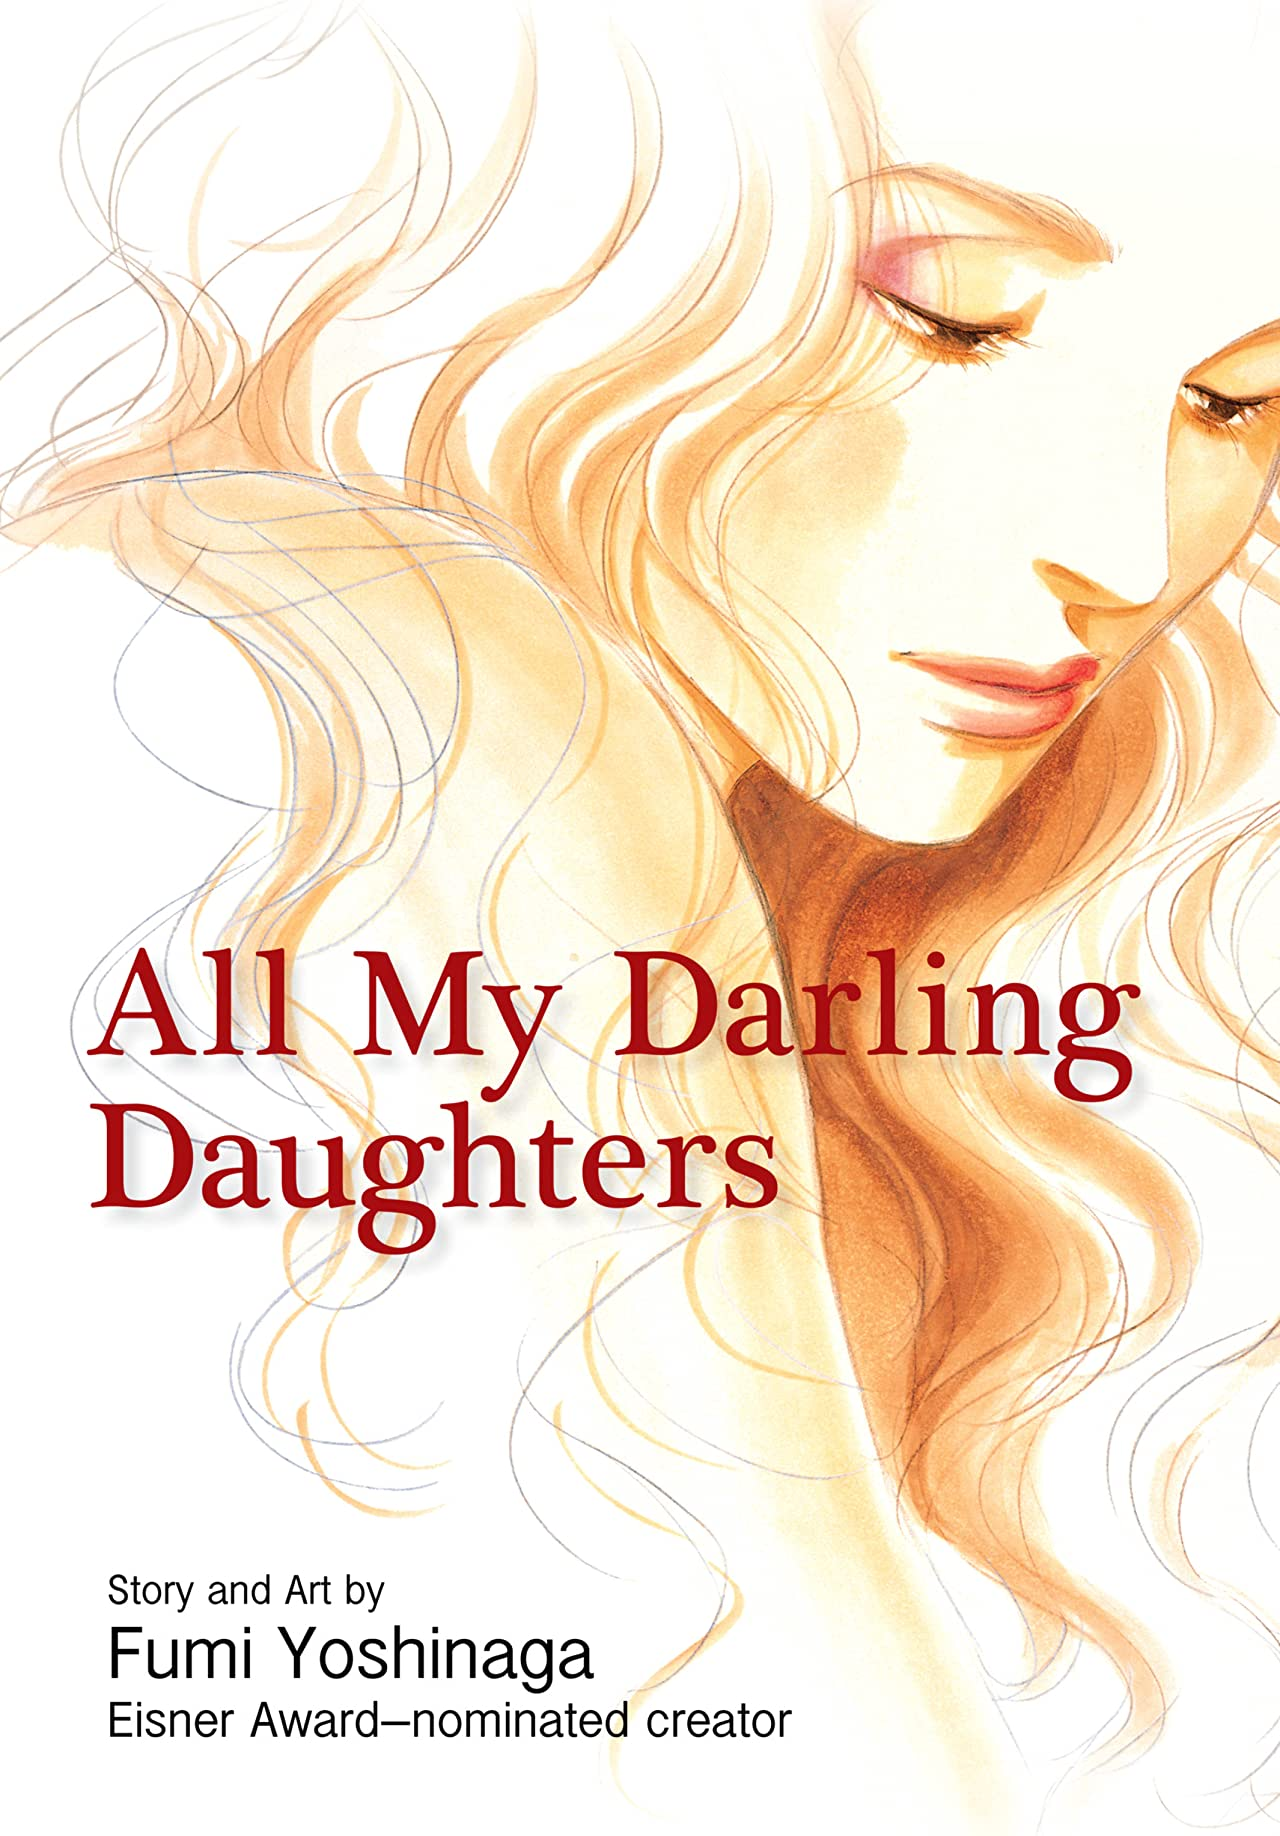 All My Darling Daughters Vol. 1